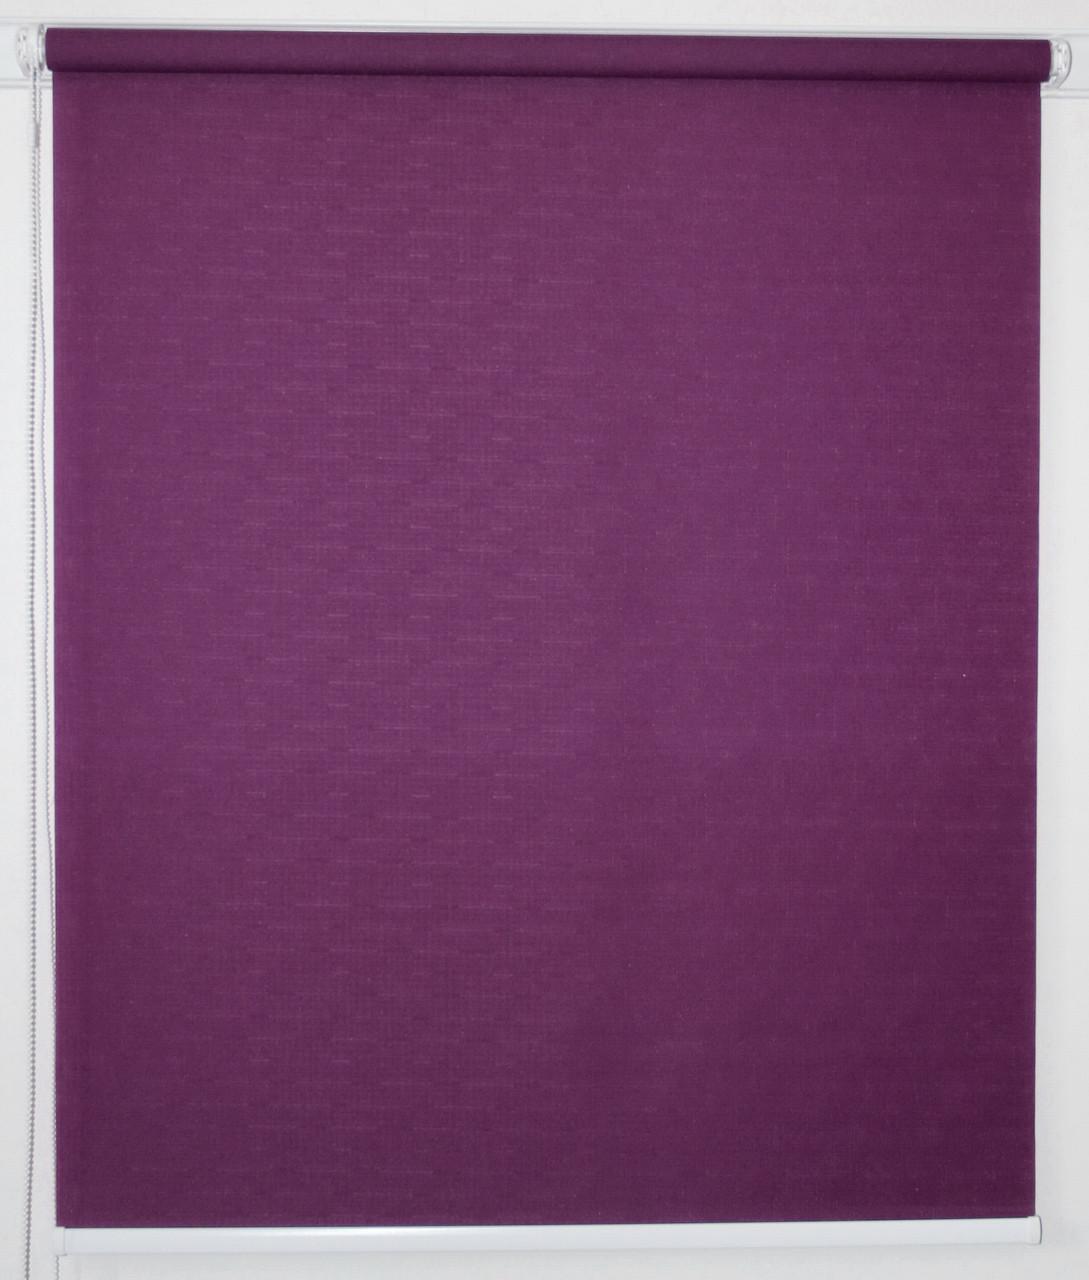 Рулонная штора 325*1500 Лён 613 Фиолетовый